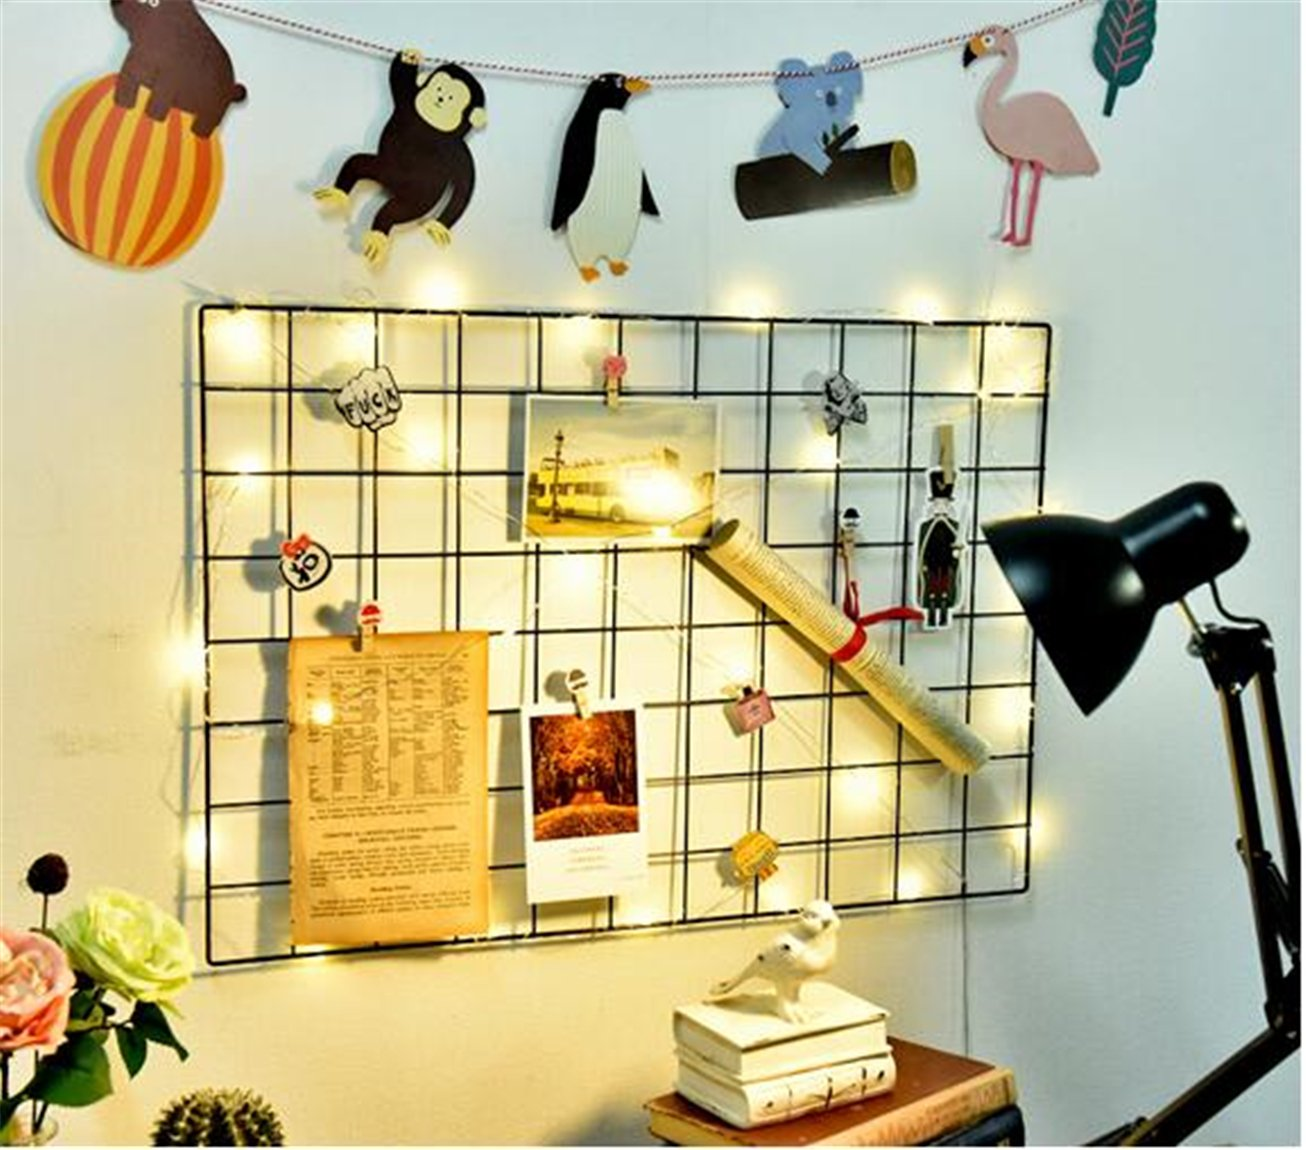 Amazon.com: SHUCV Iron grid of the photo wall simple decoration ...